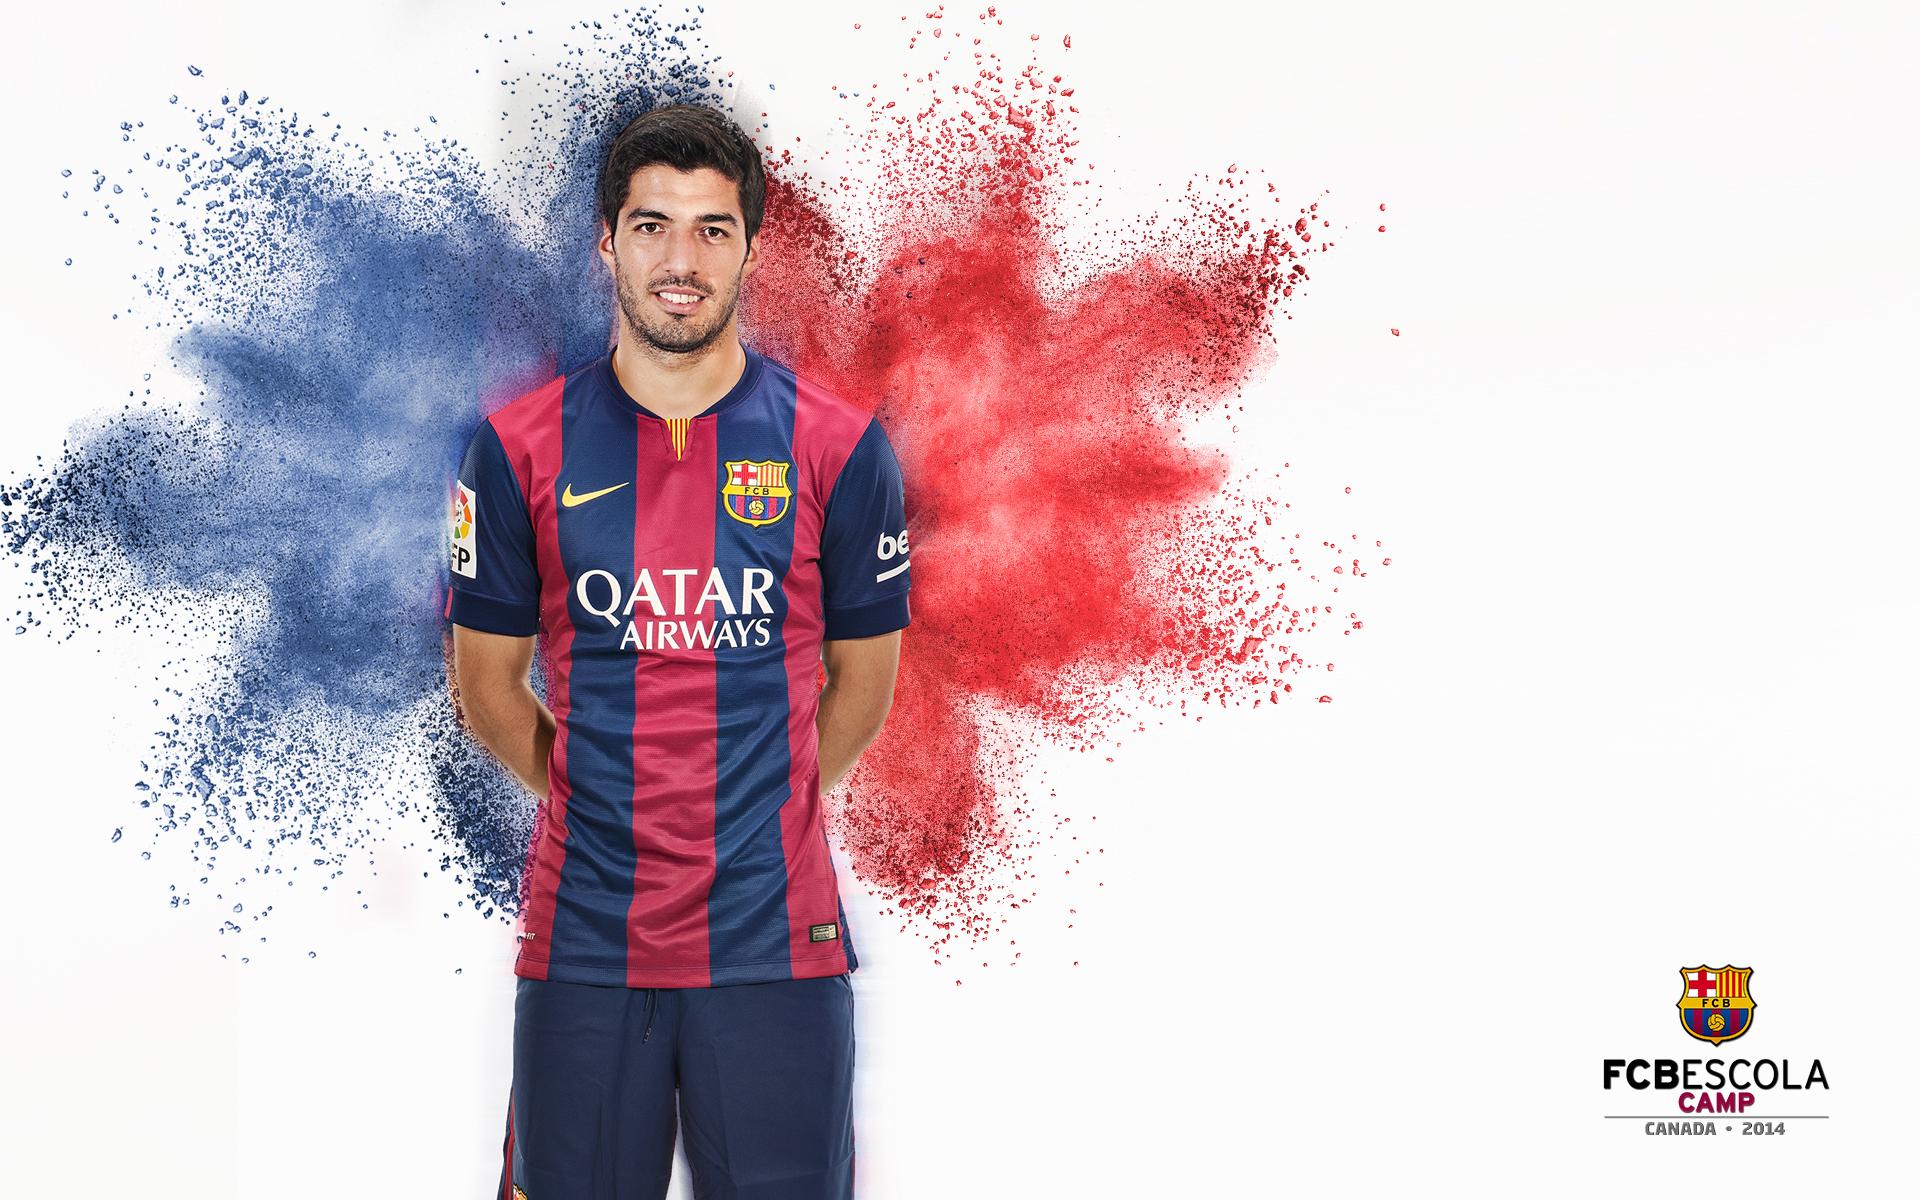 Fc Barcelona Official Website >> Messi Neymar Suarez Wallpaper - WallpaperSafari